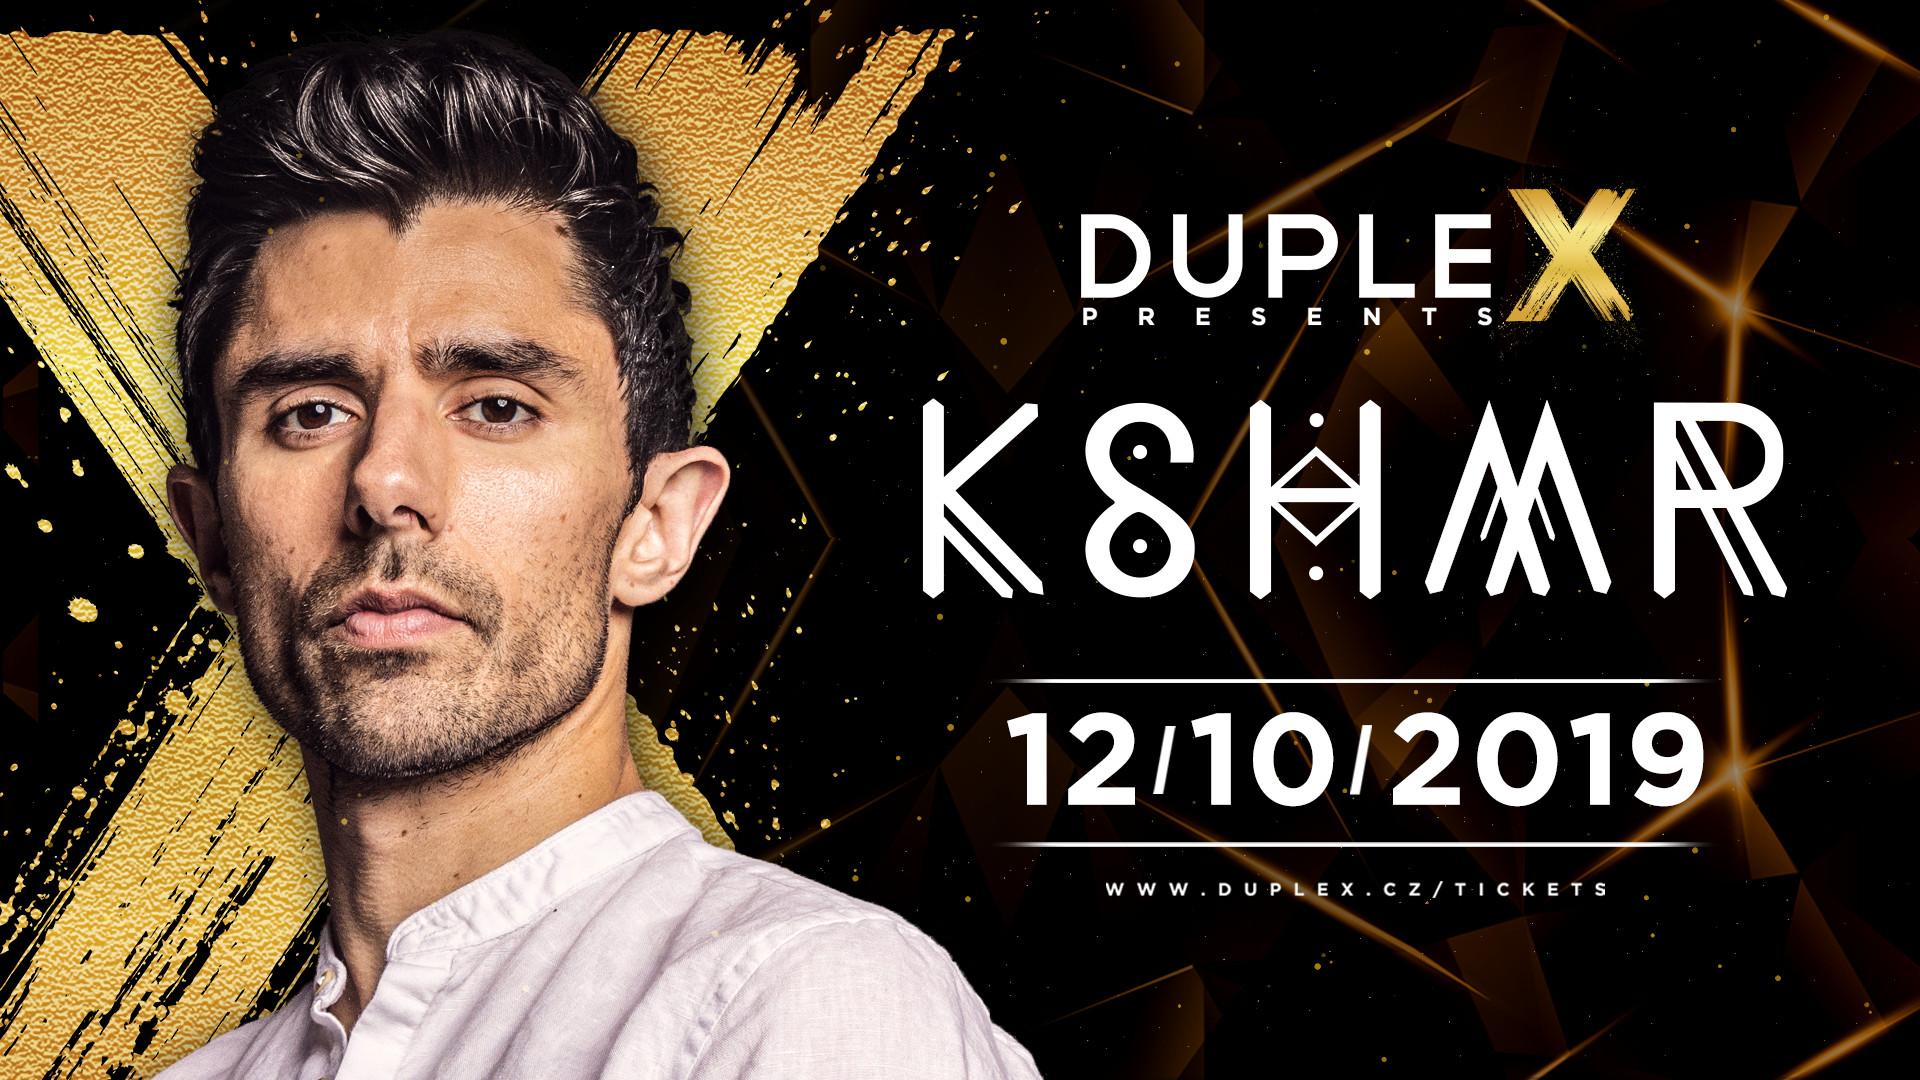 KSHMR hostem říjnové Duplex Presents